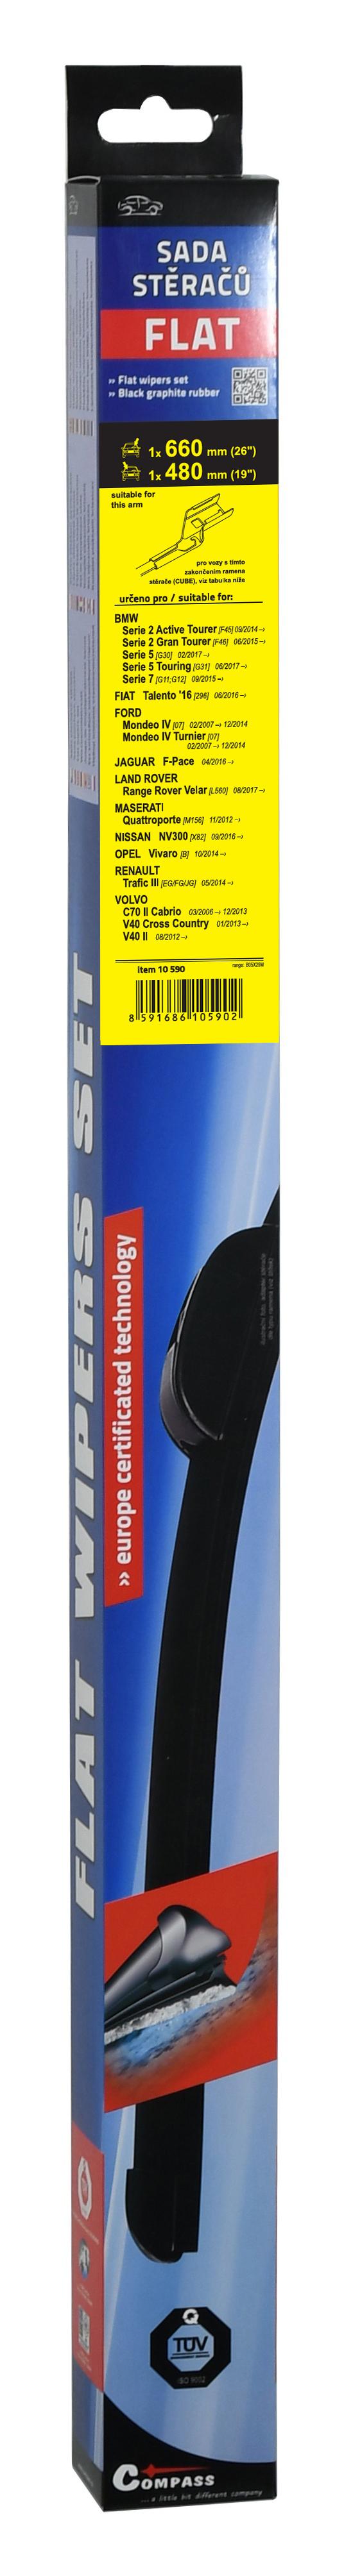 Stěrače FLAT SET (CUBE) 660+480mm